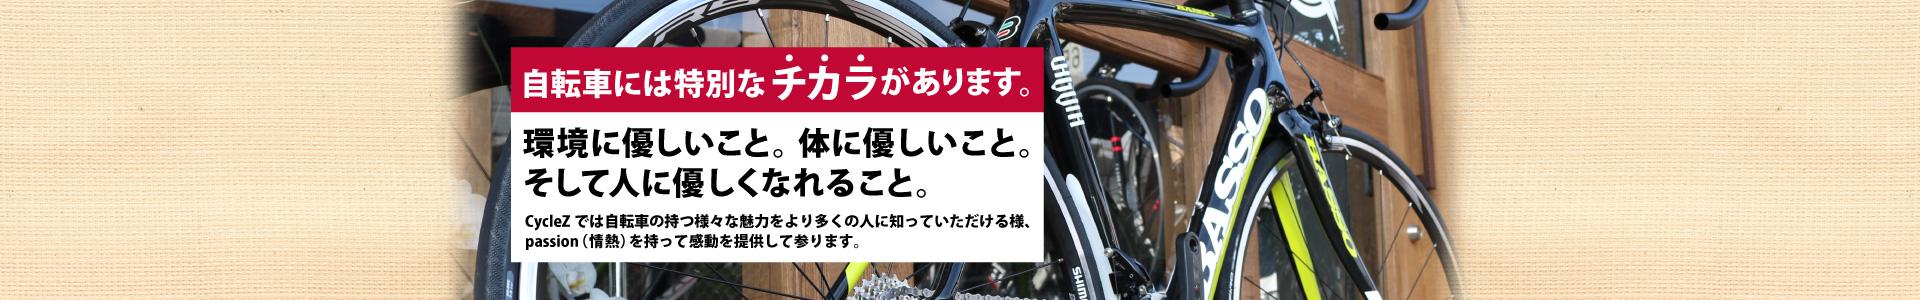 cyclez-slider02